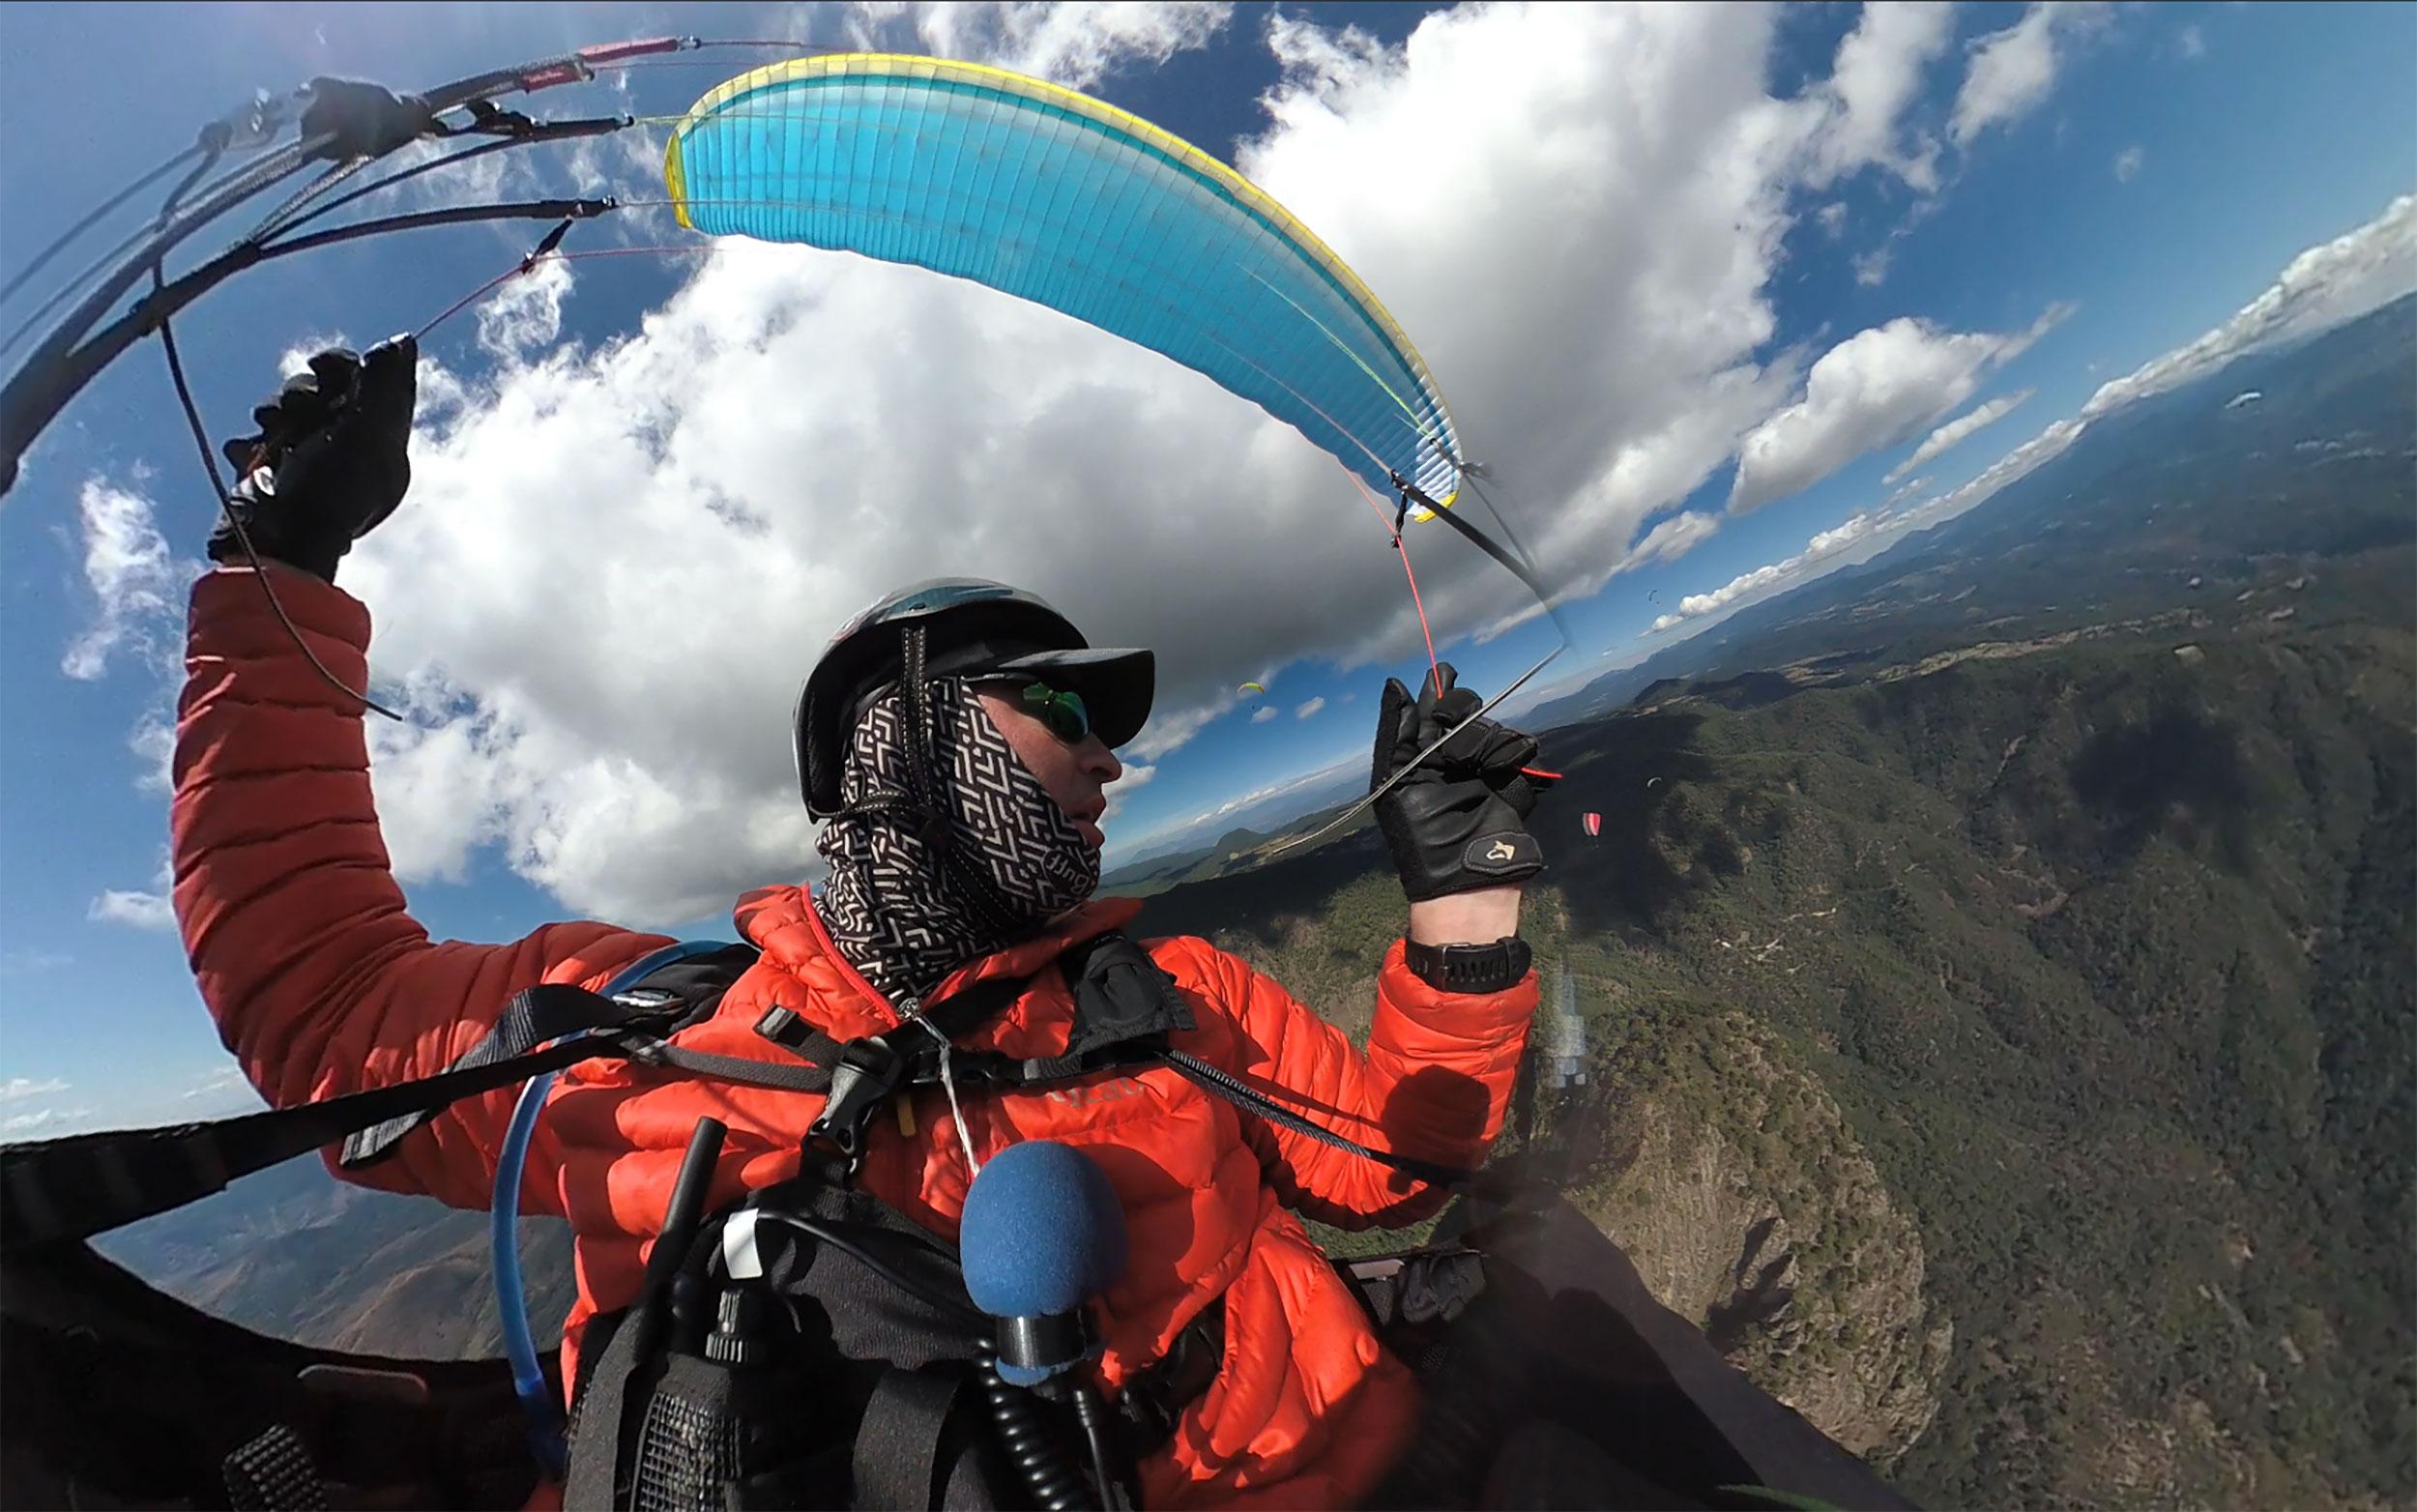 Paraglide-New-England-Trips-Valle-de-Bravo-Mexico-Gallery-Over-Penon.jpg